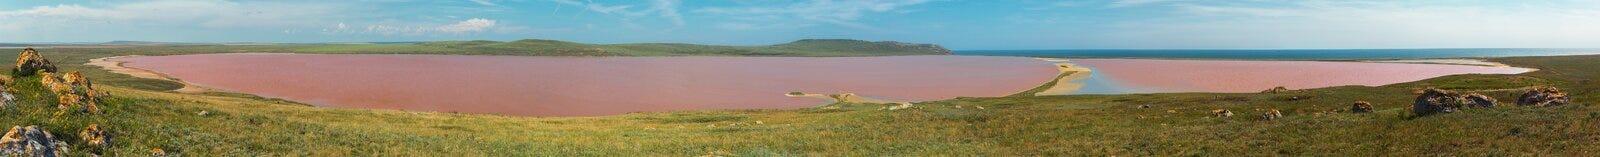 Salt Lake Koyashskoe Elkenskoe. Opuksky Reserve Stock Image